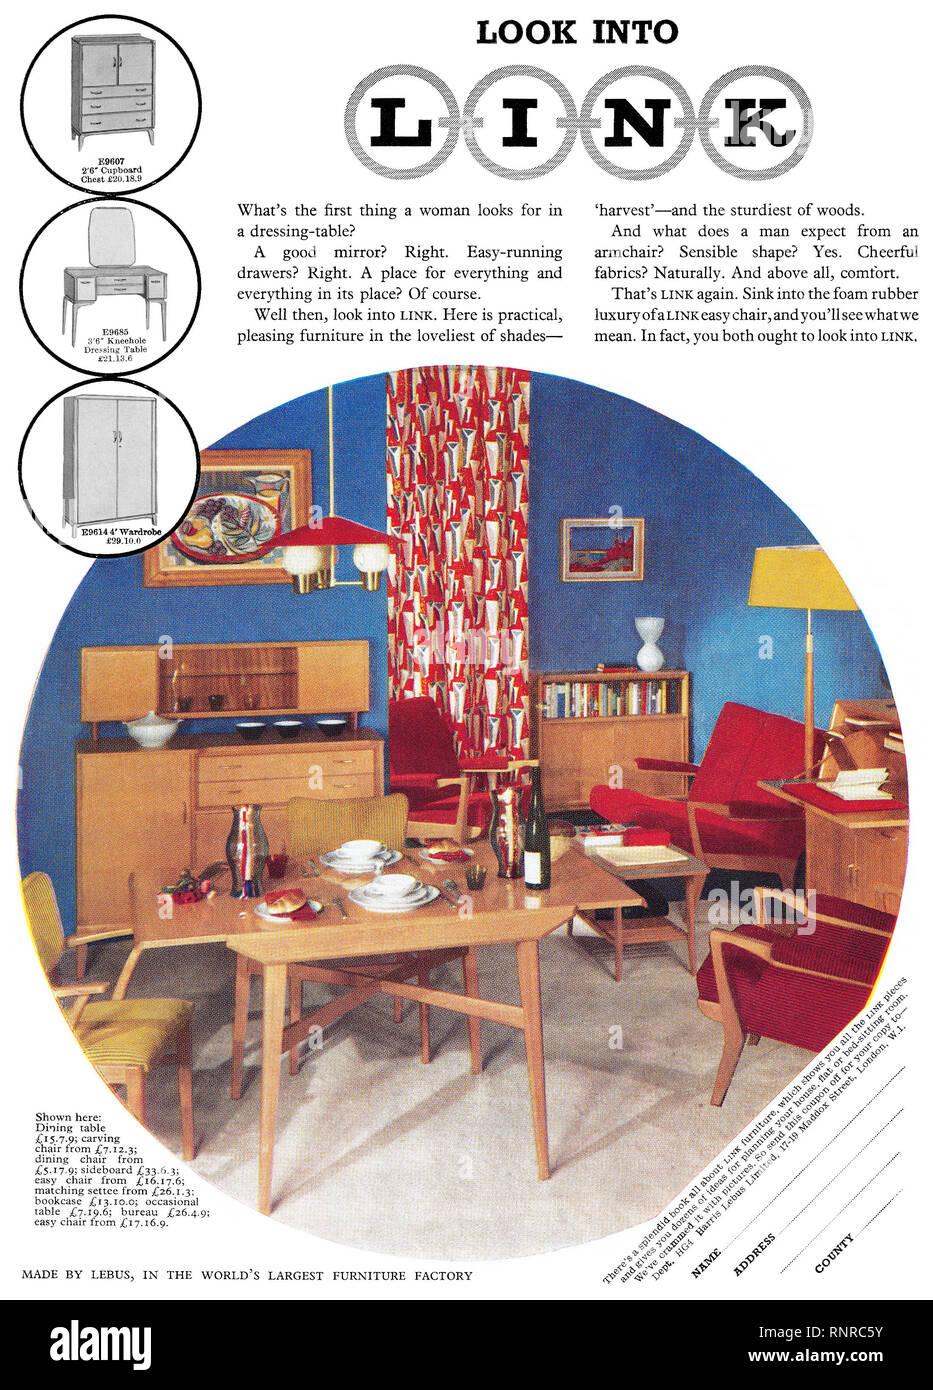 1956 British advertisement for Link Furniture. - Stock Image